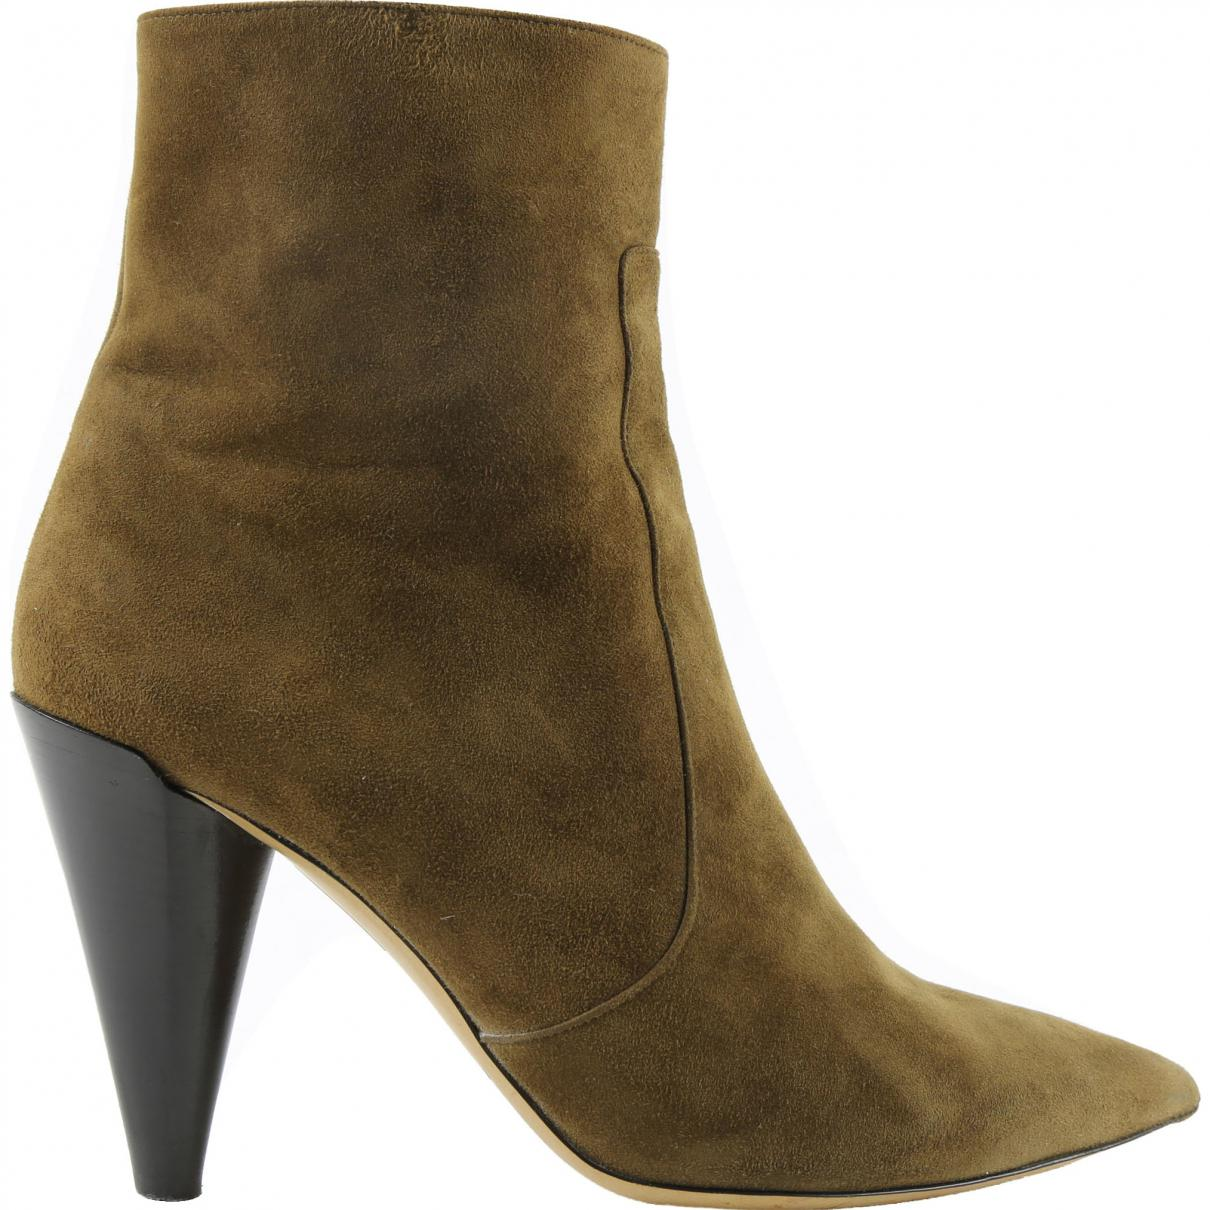 Pre-owned - Ankle boots Isabel Marant HW70JR